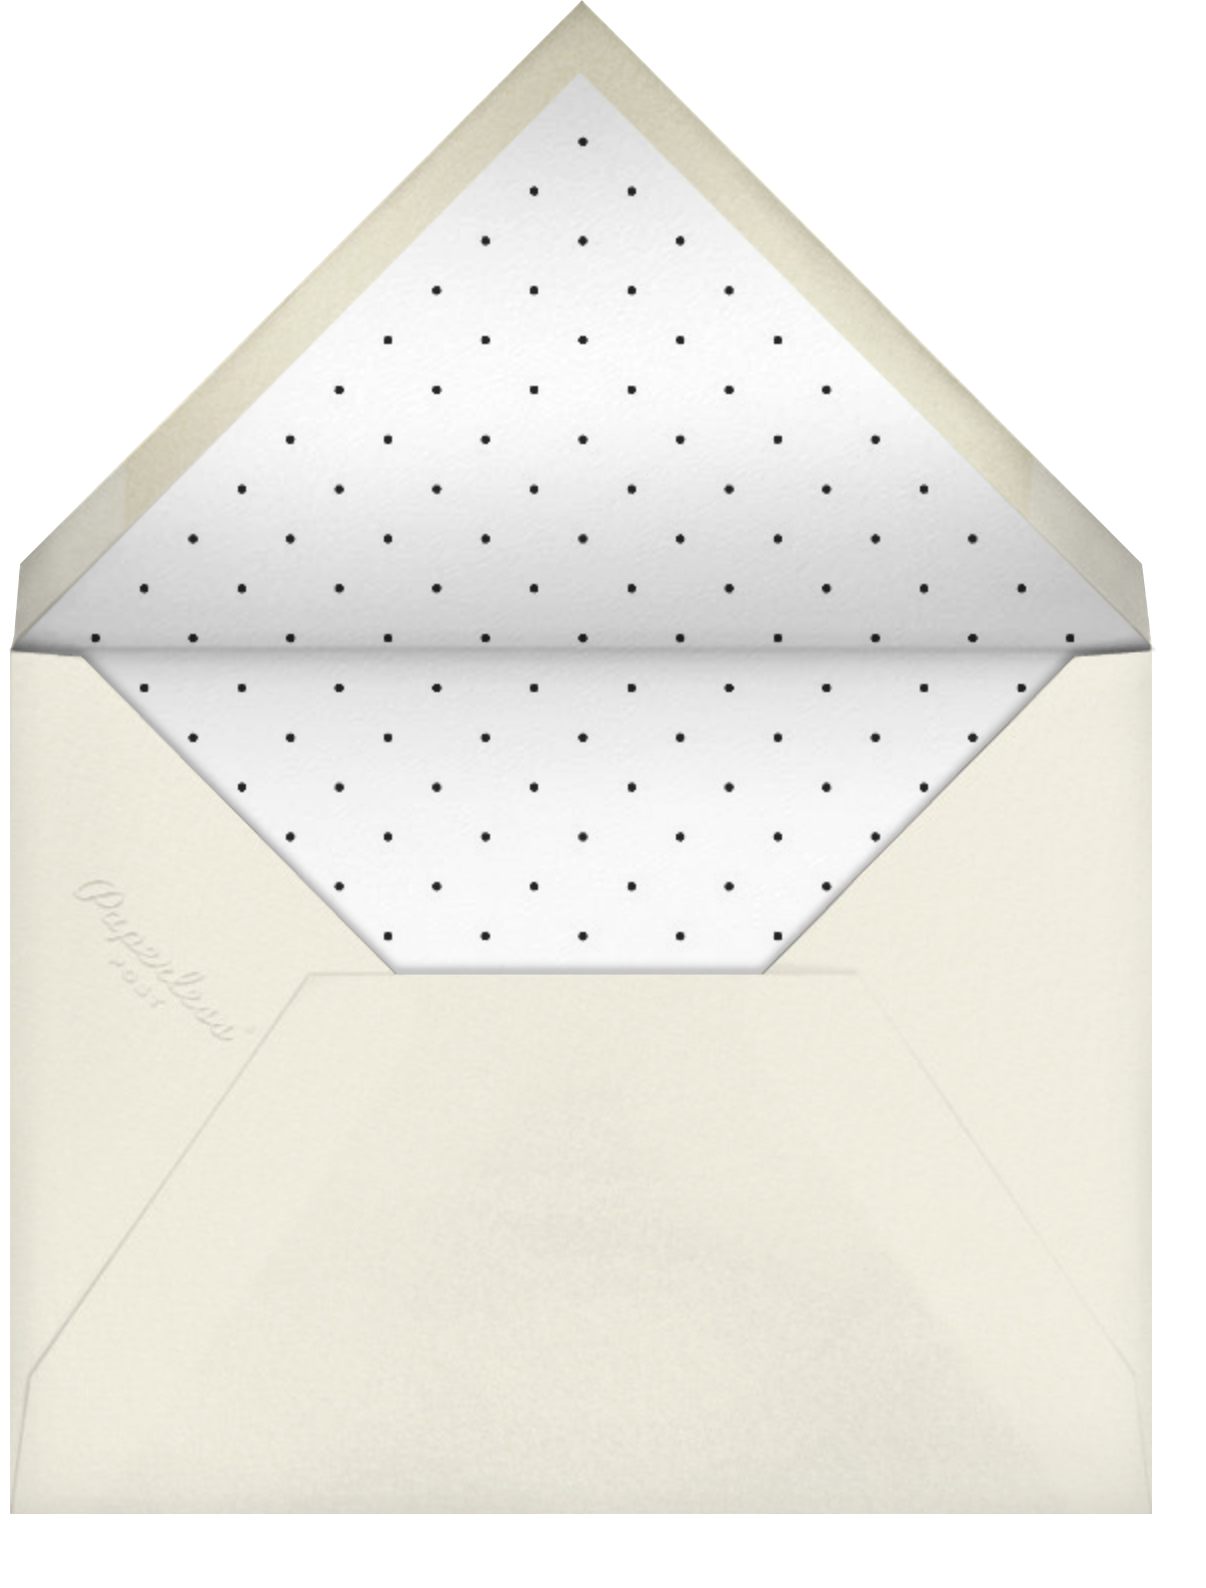 Tandem I (Photo Save the Date) - kate spade new york - Envelope